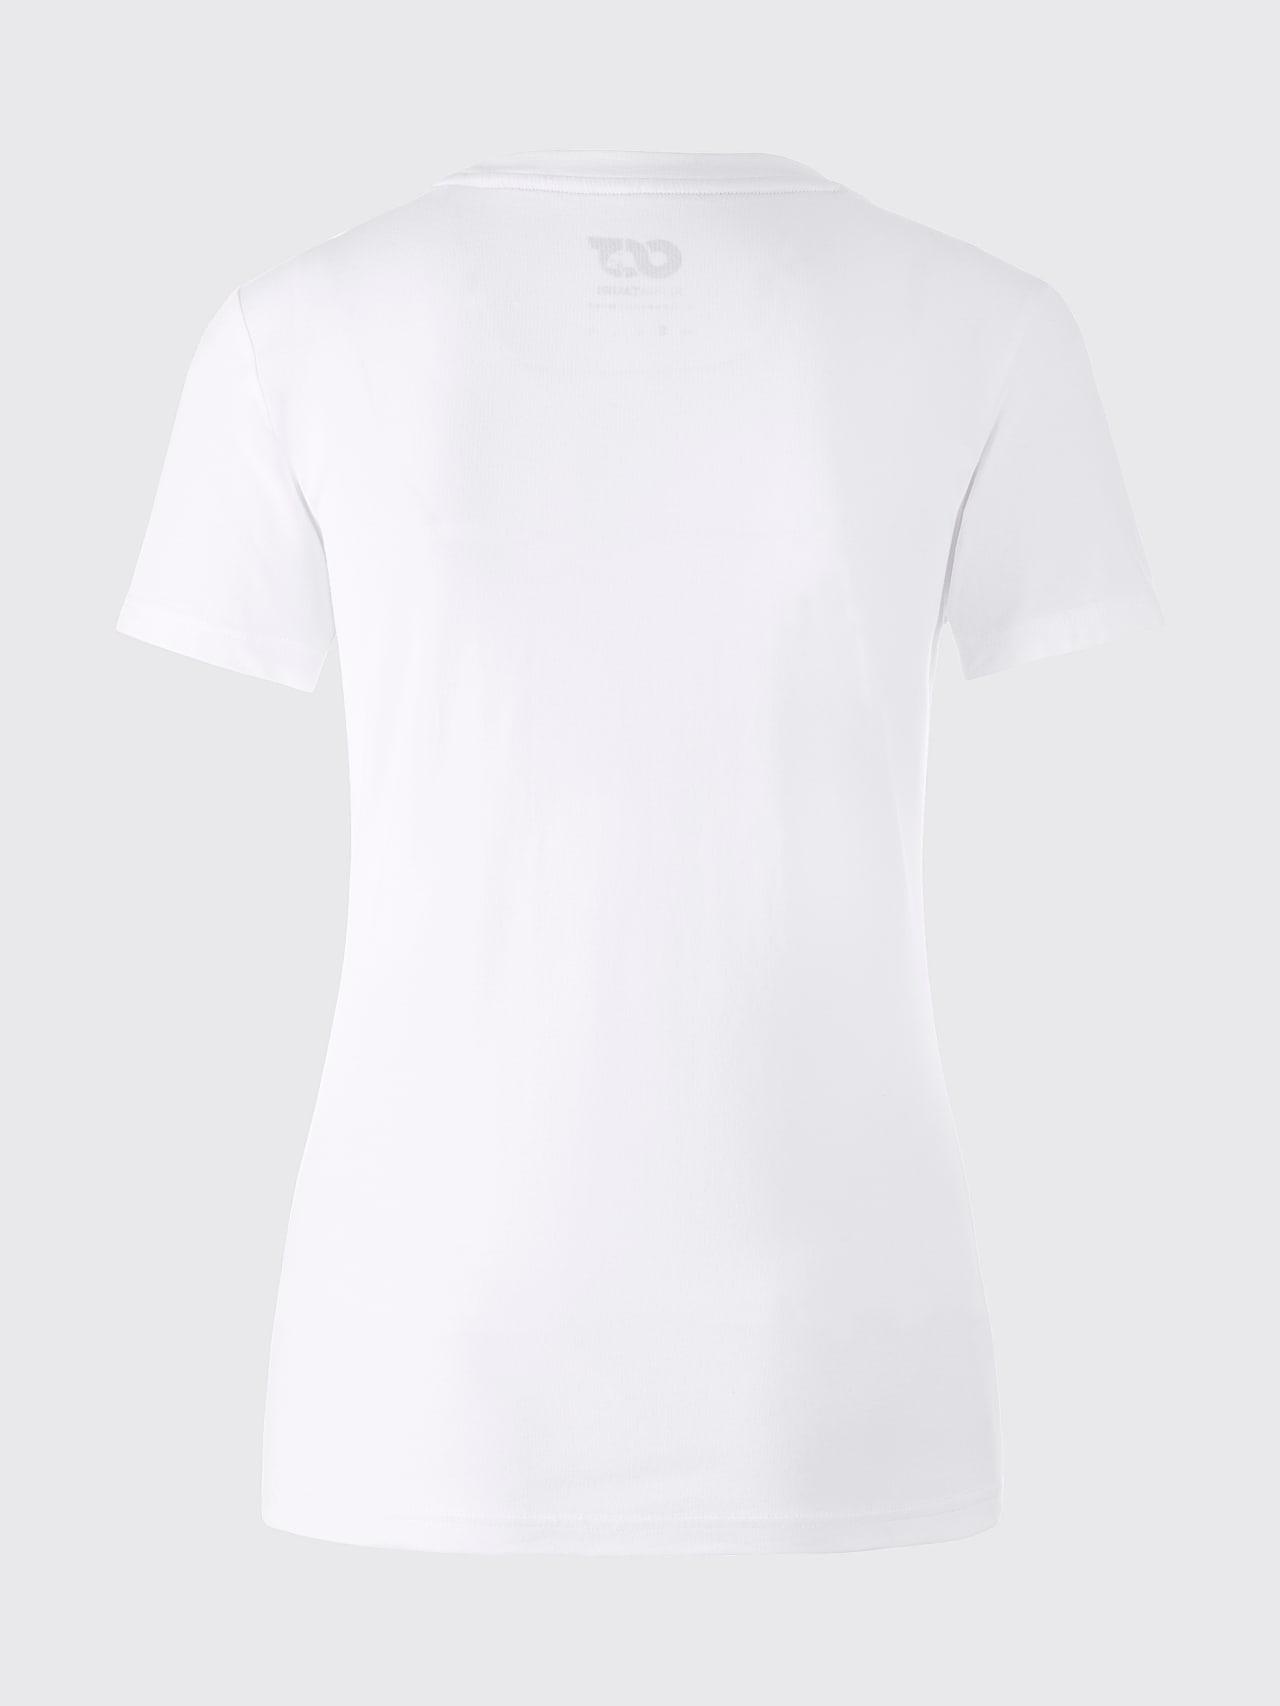 JALP V4.Y5.01 Cotton Logo T-Shirt white Left Alpha Tauri